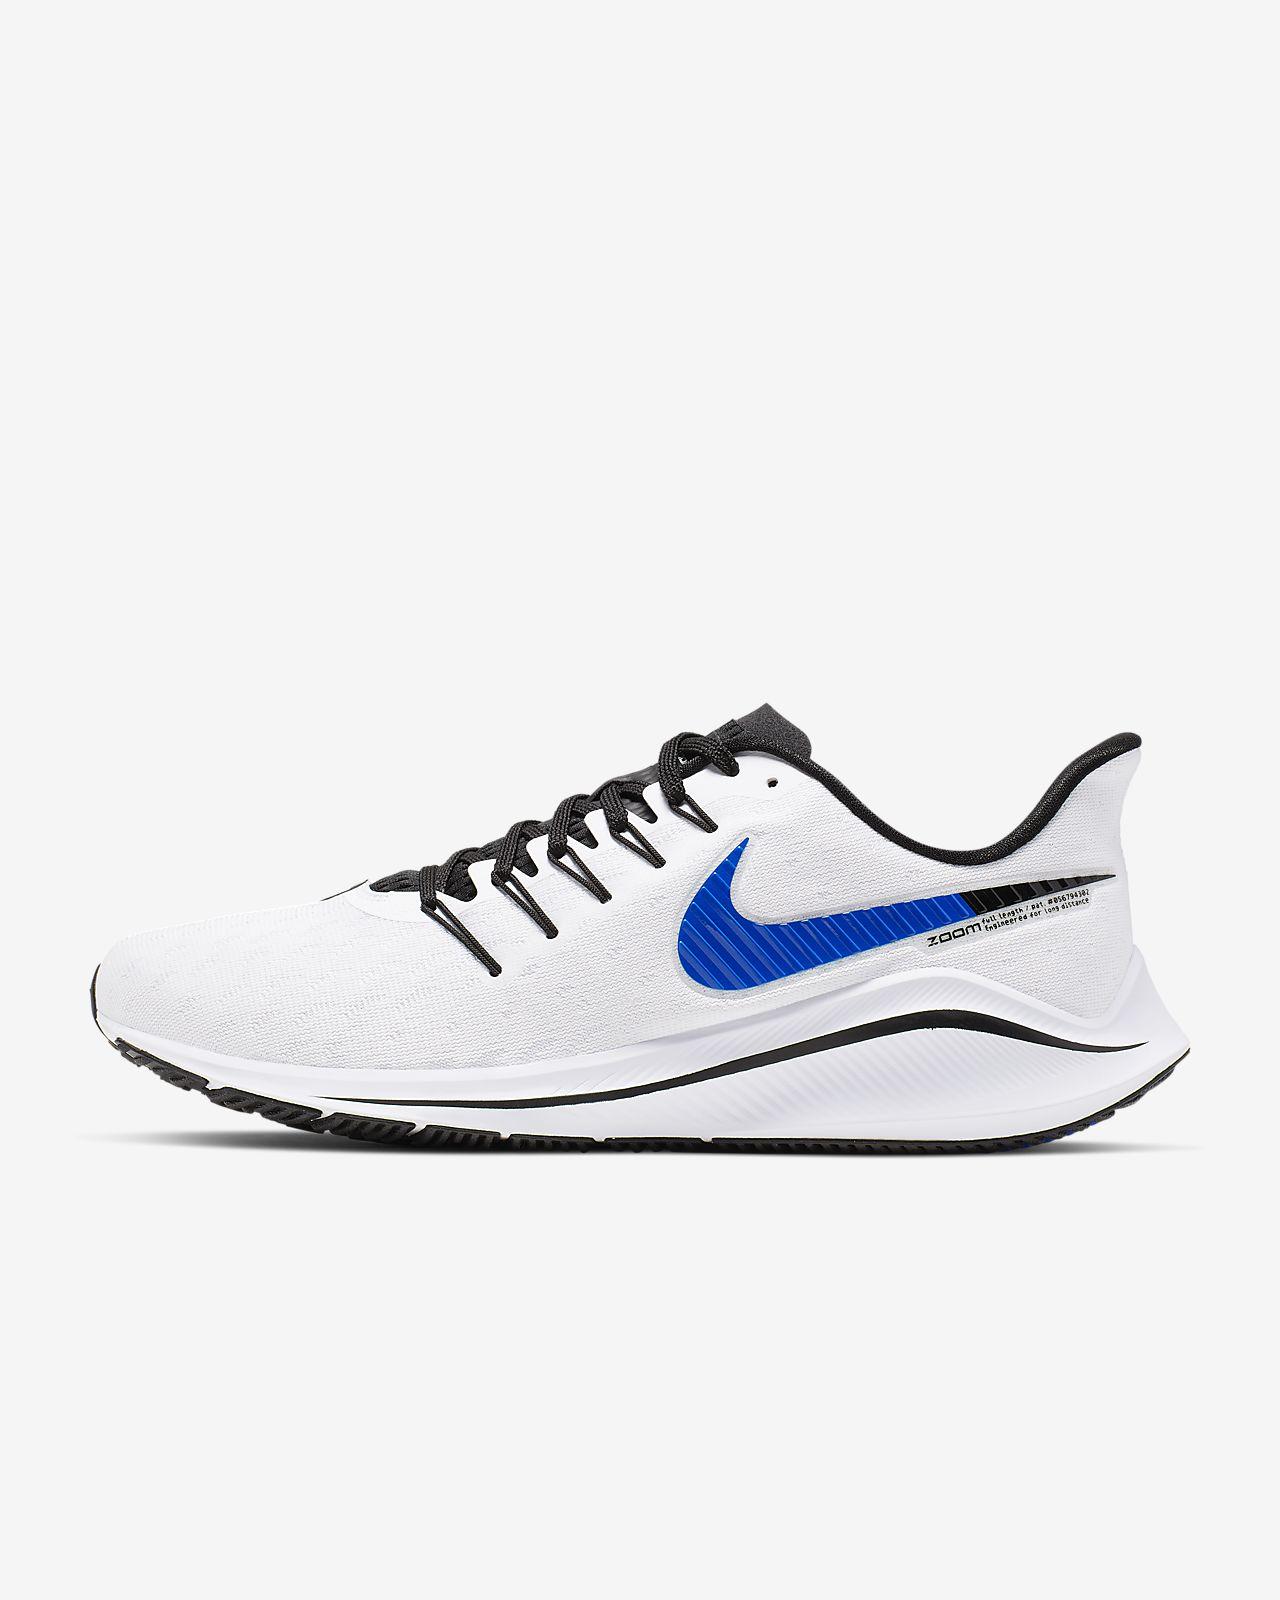 729c398d30533 Nike Air Zoom Vomero 14 Men's Running Shoe. Nike.com CA